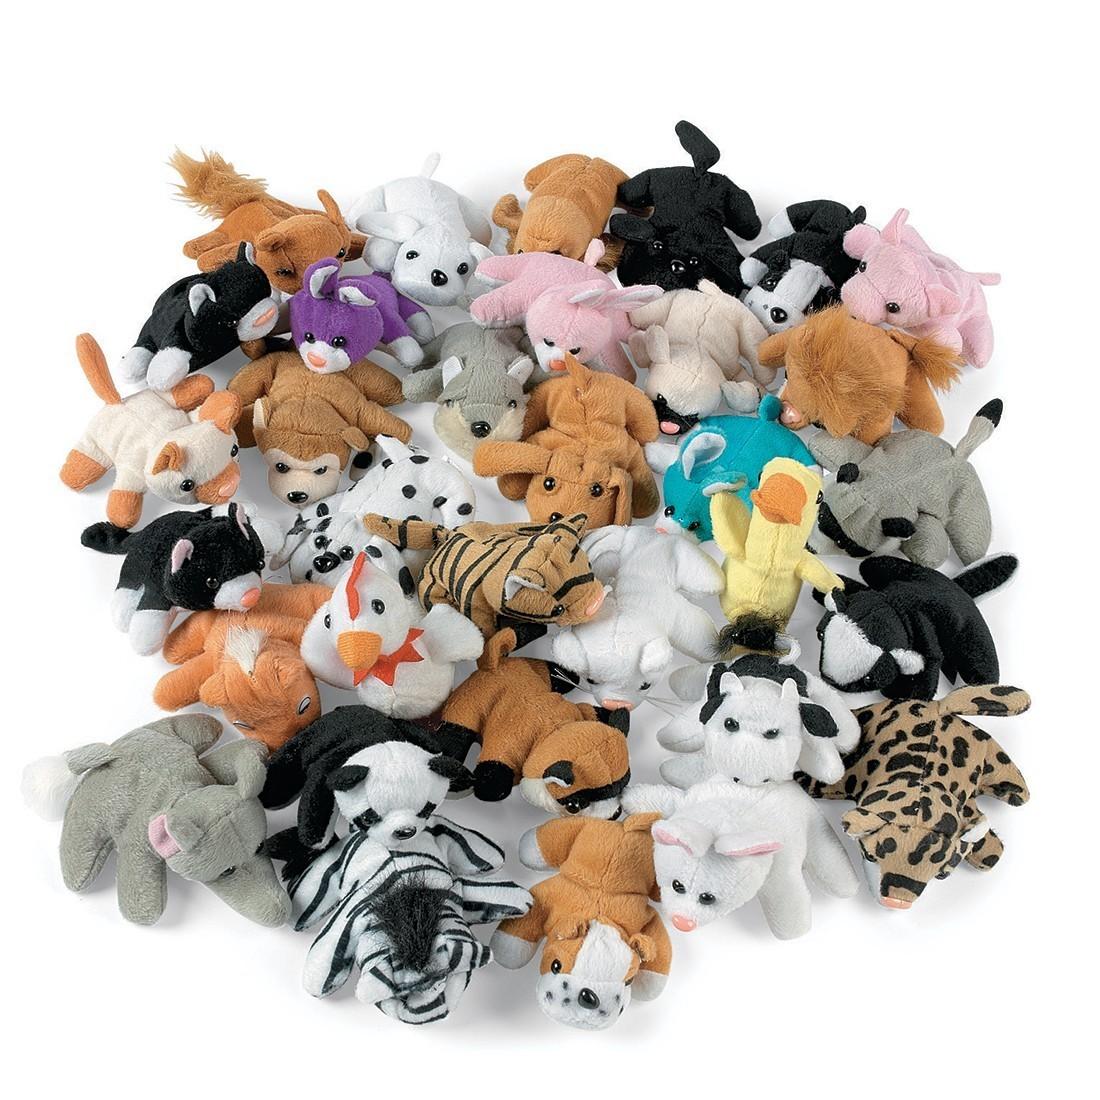 Assorted Plush Animals [image]